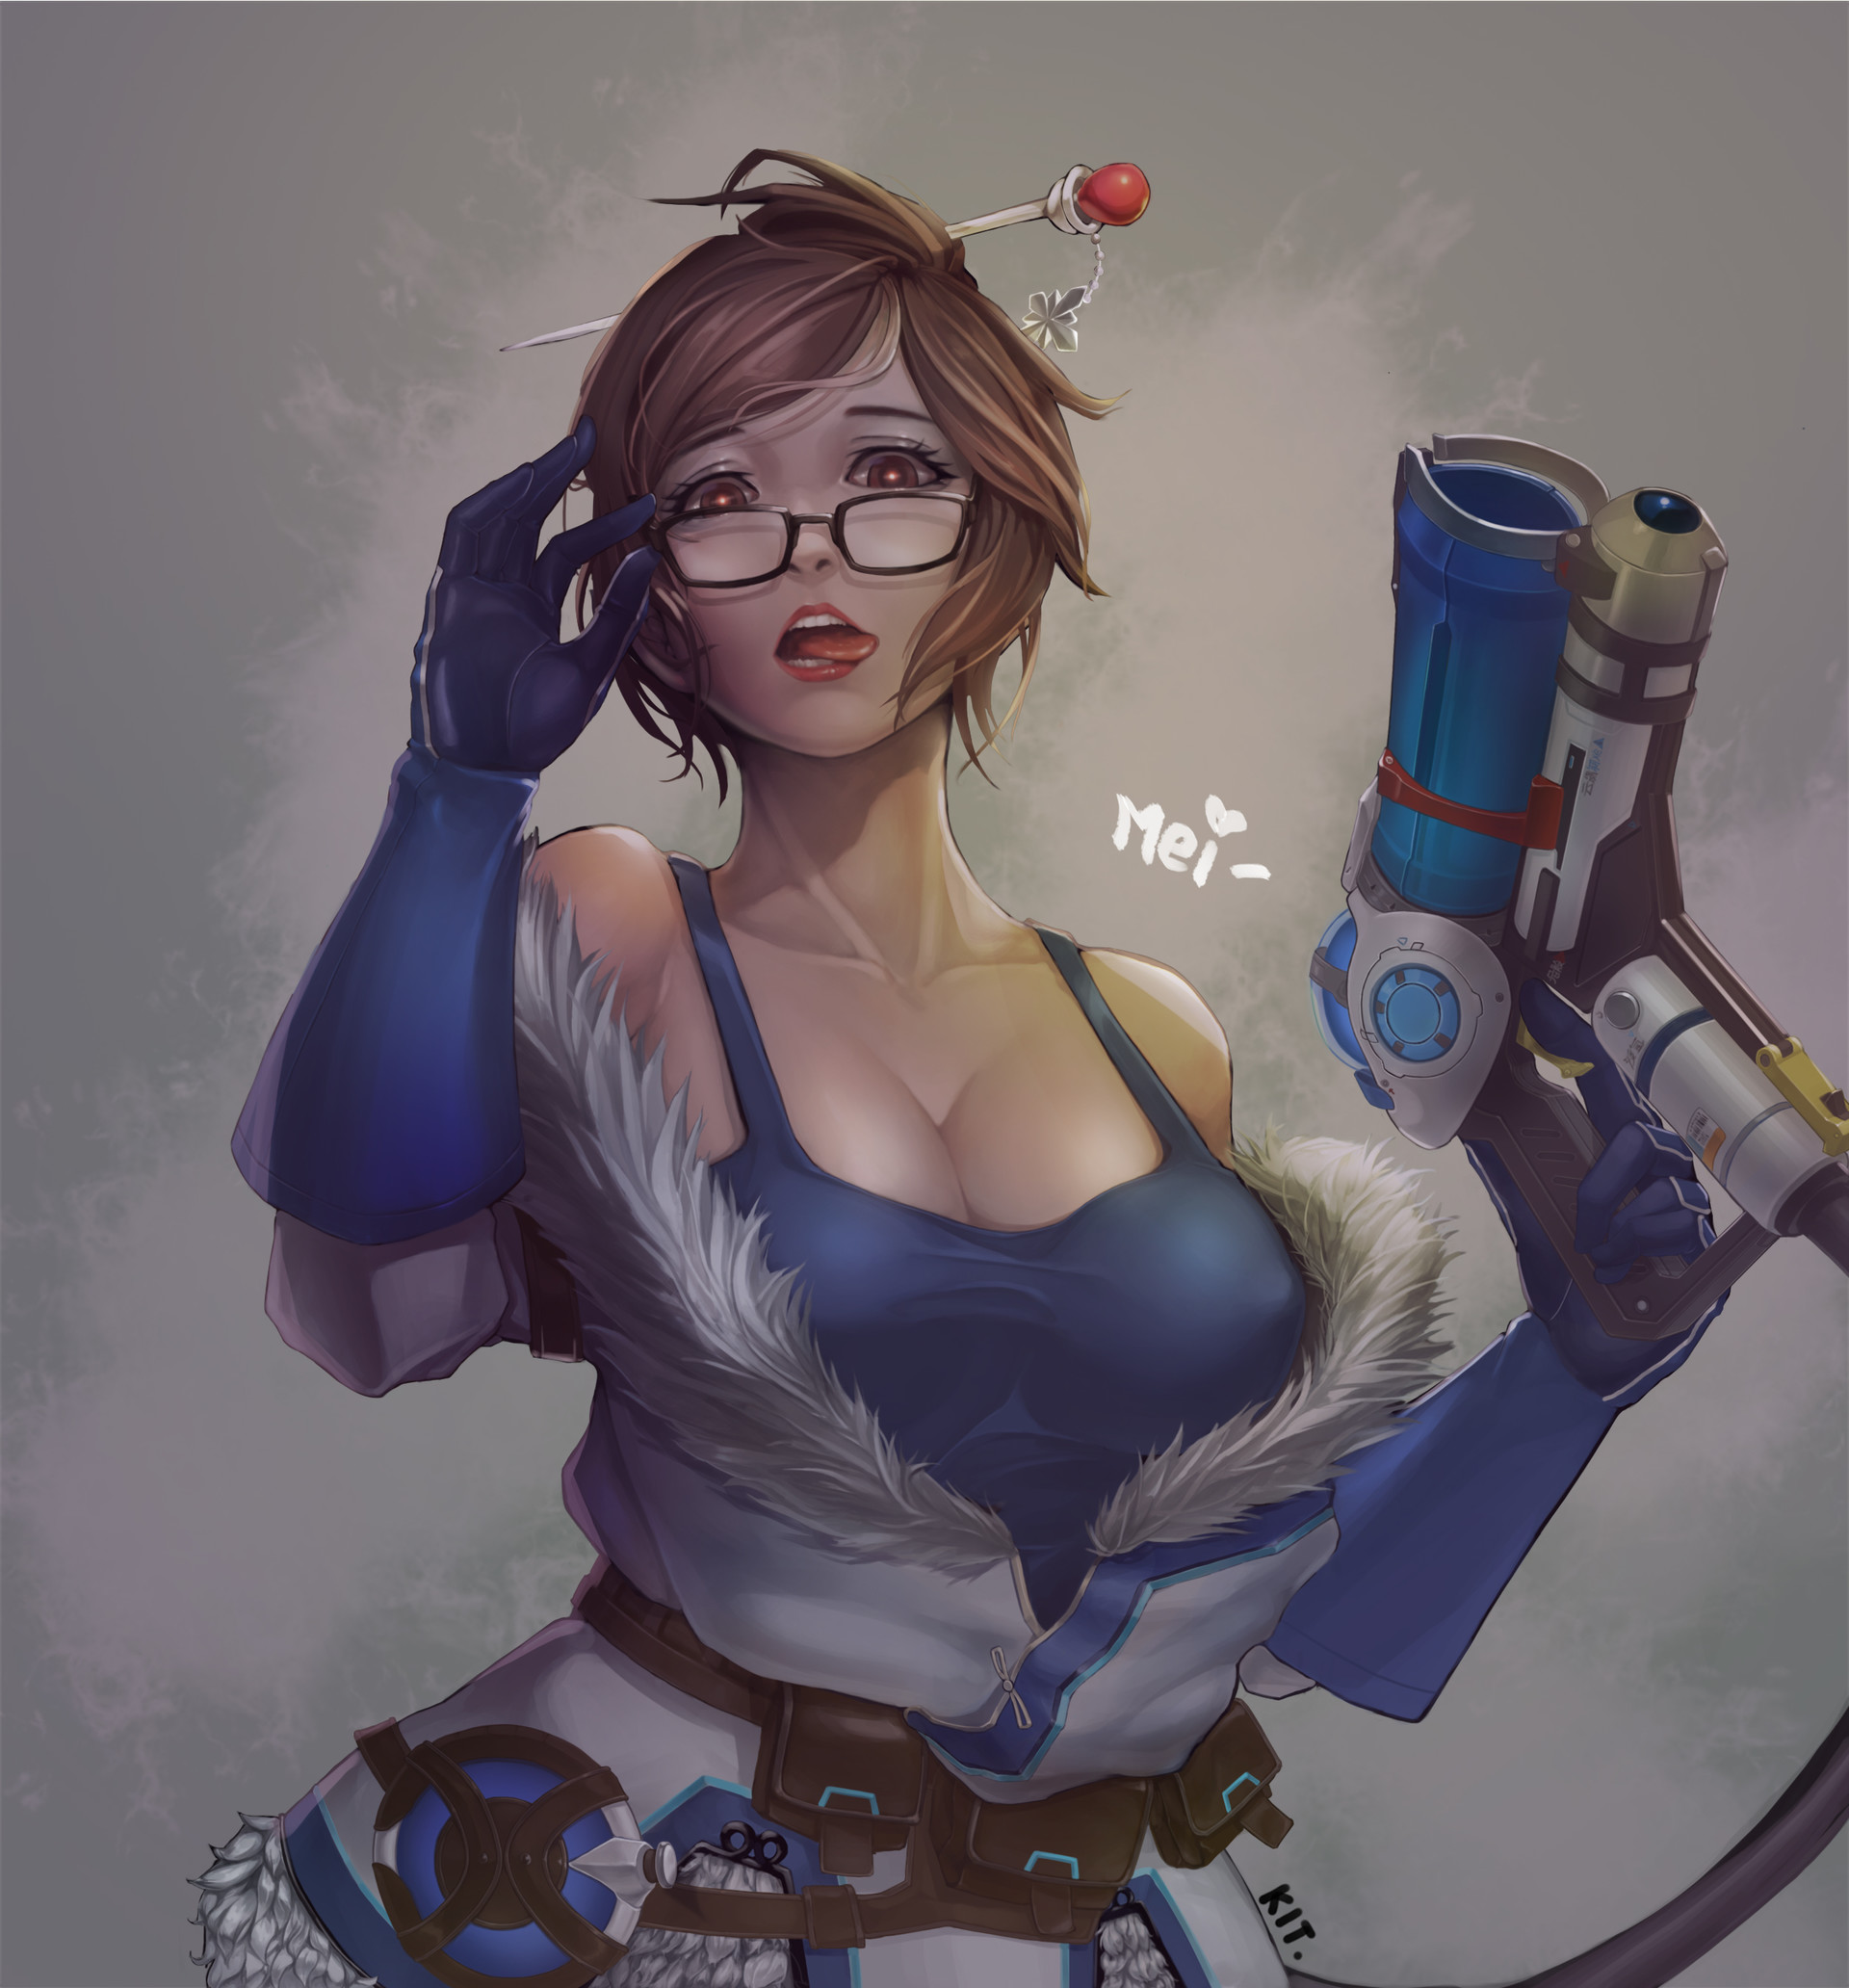 Sexy mei overwatch